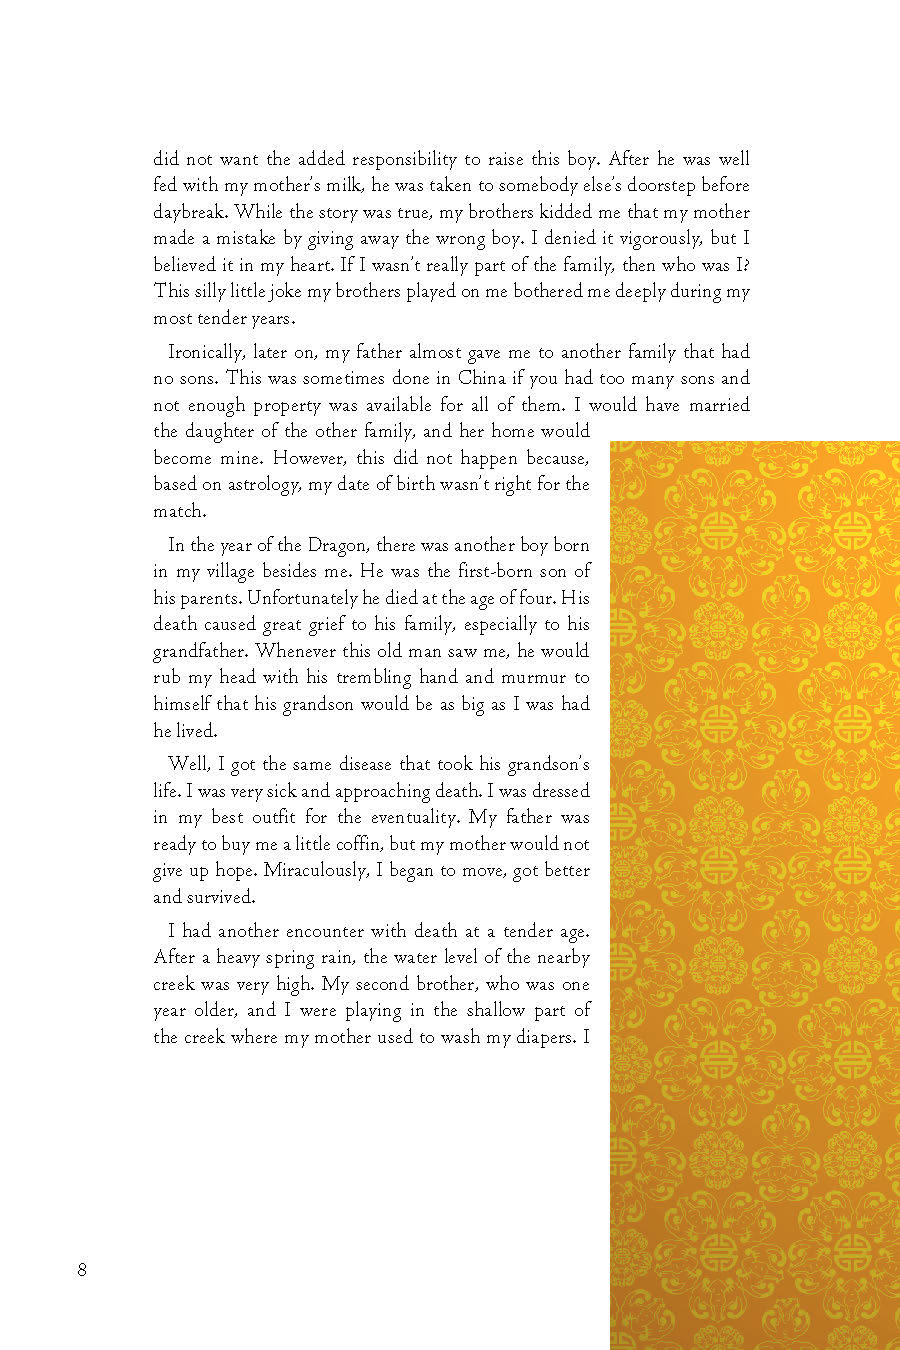 binder4_page_12.jpg